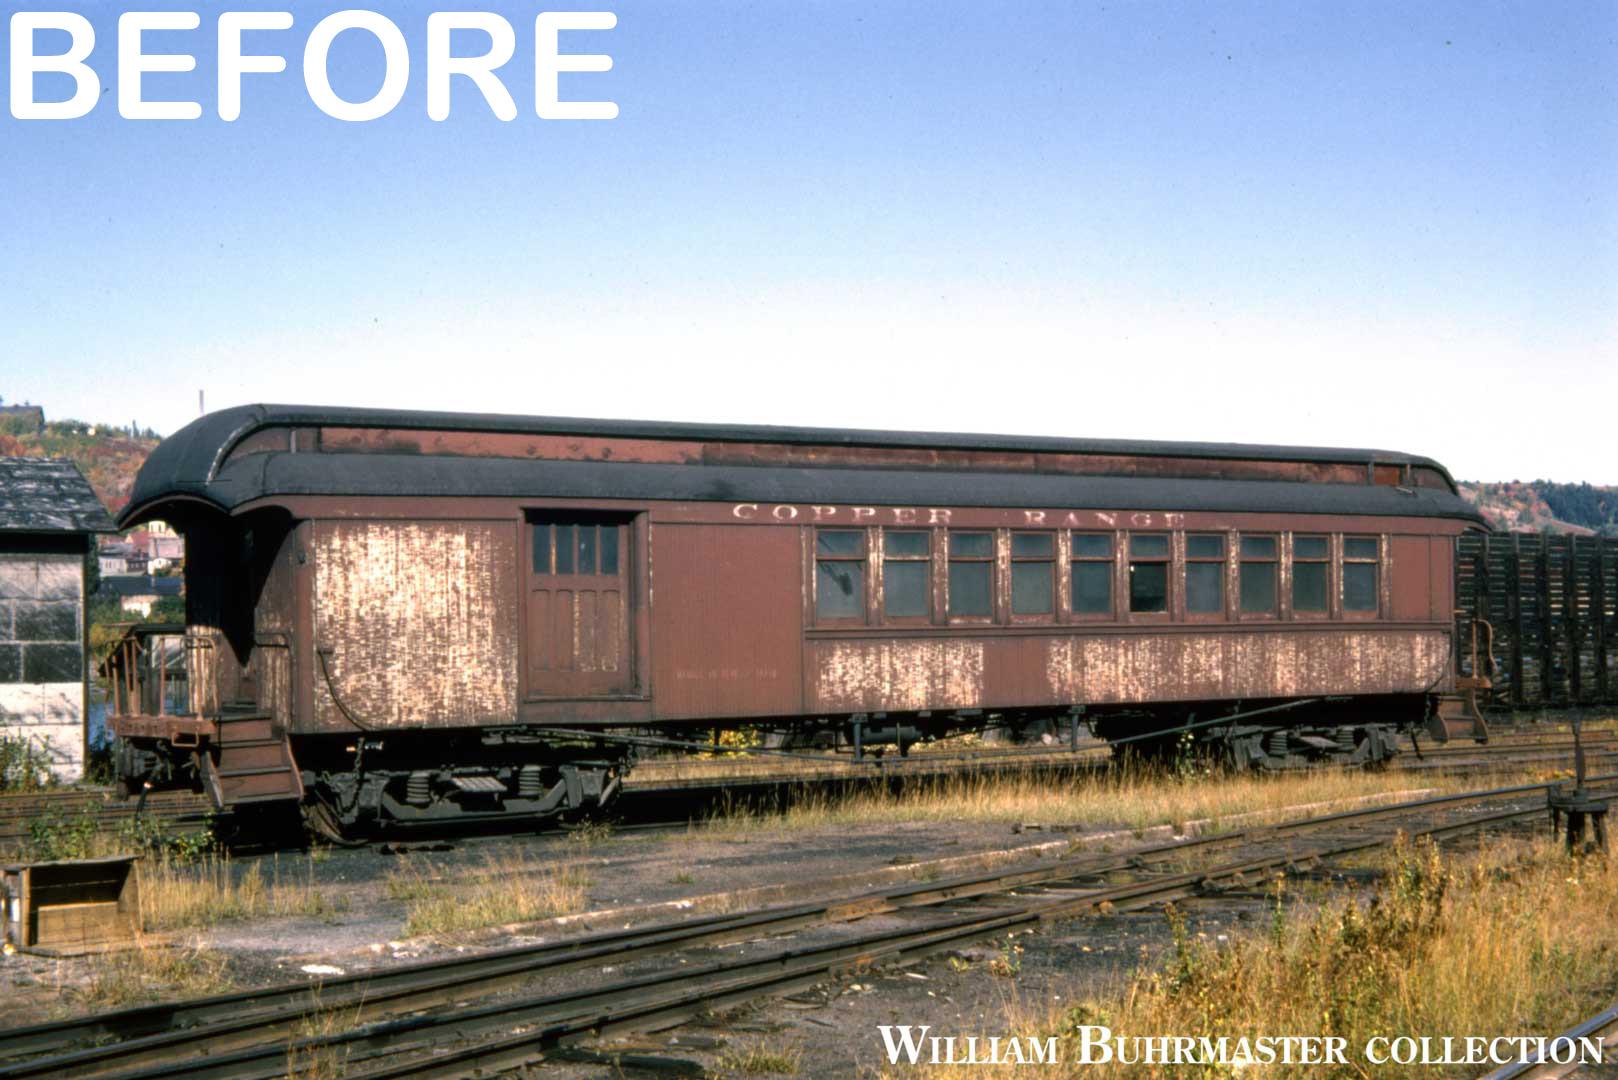 Copper Range #25 Before Restoration